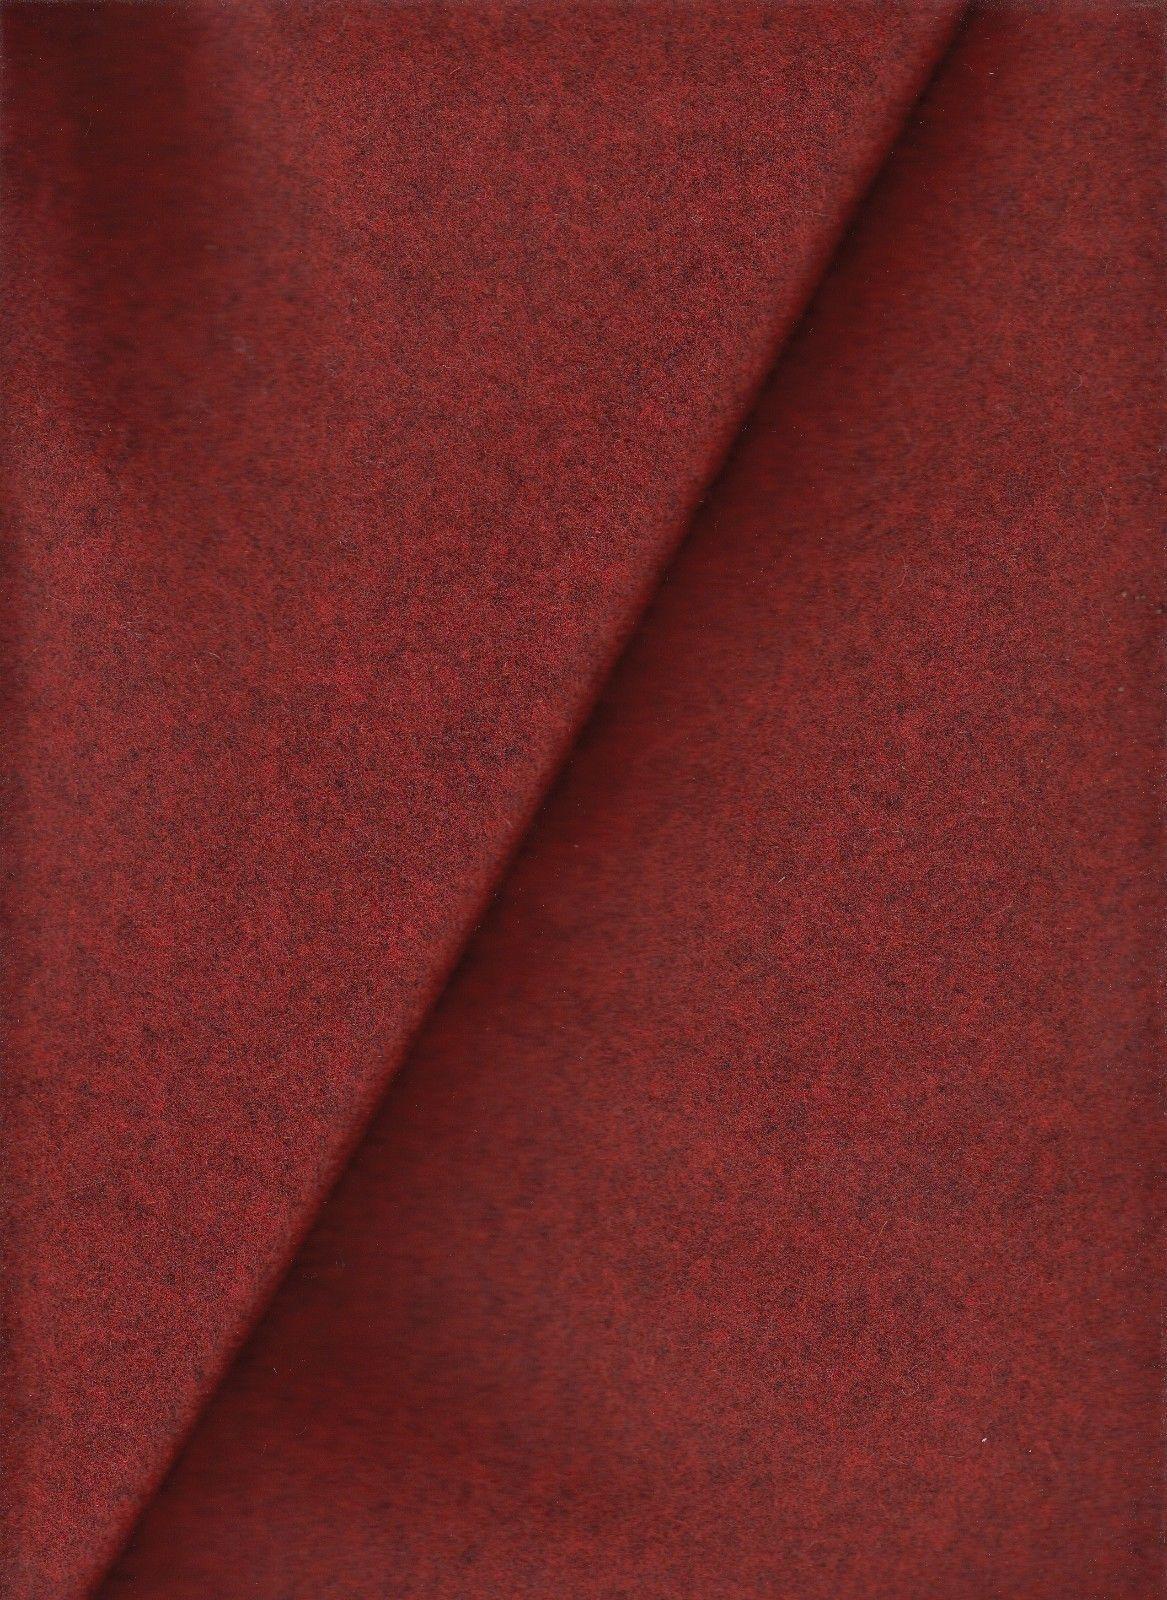 8.125 yds Mid Century Modern Wool Upholstery Fabric Red Melange PA